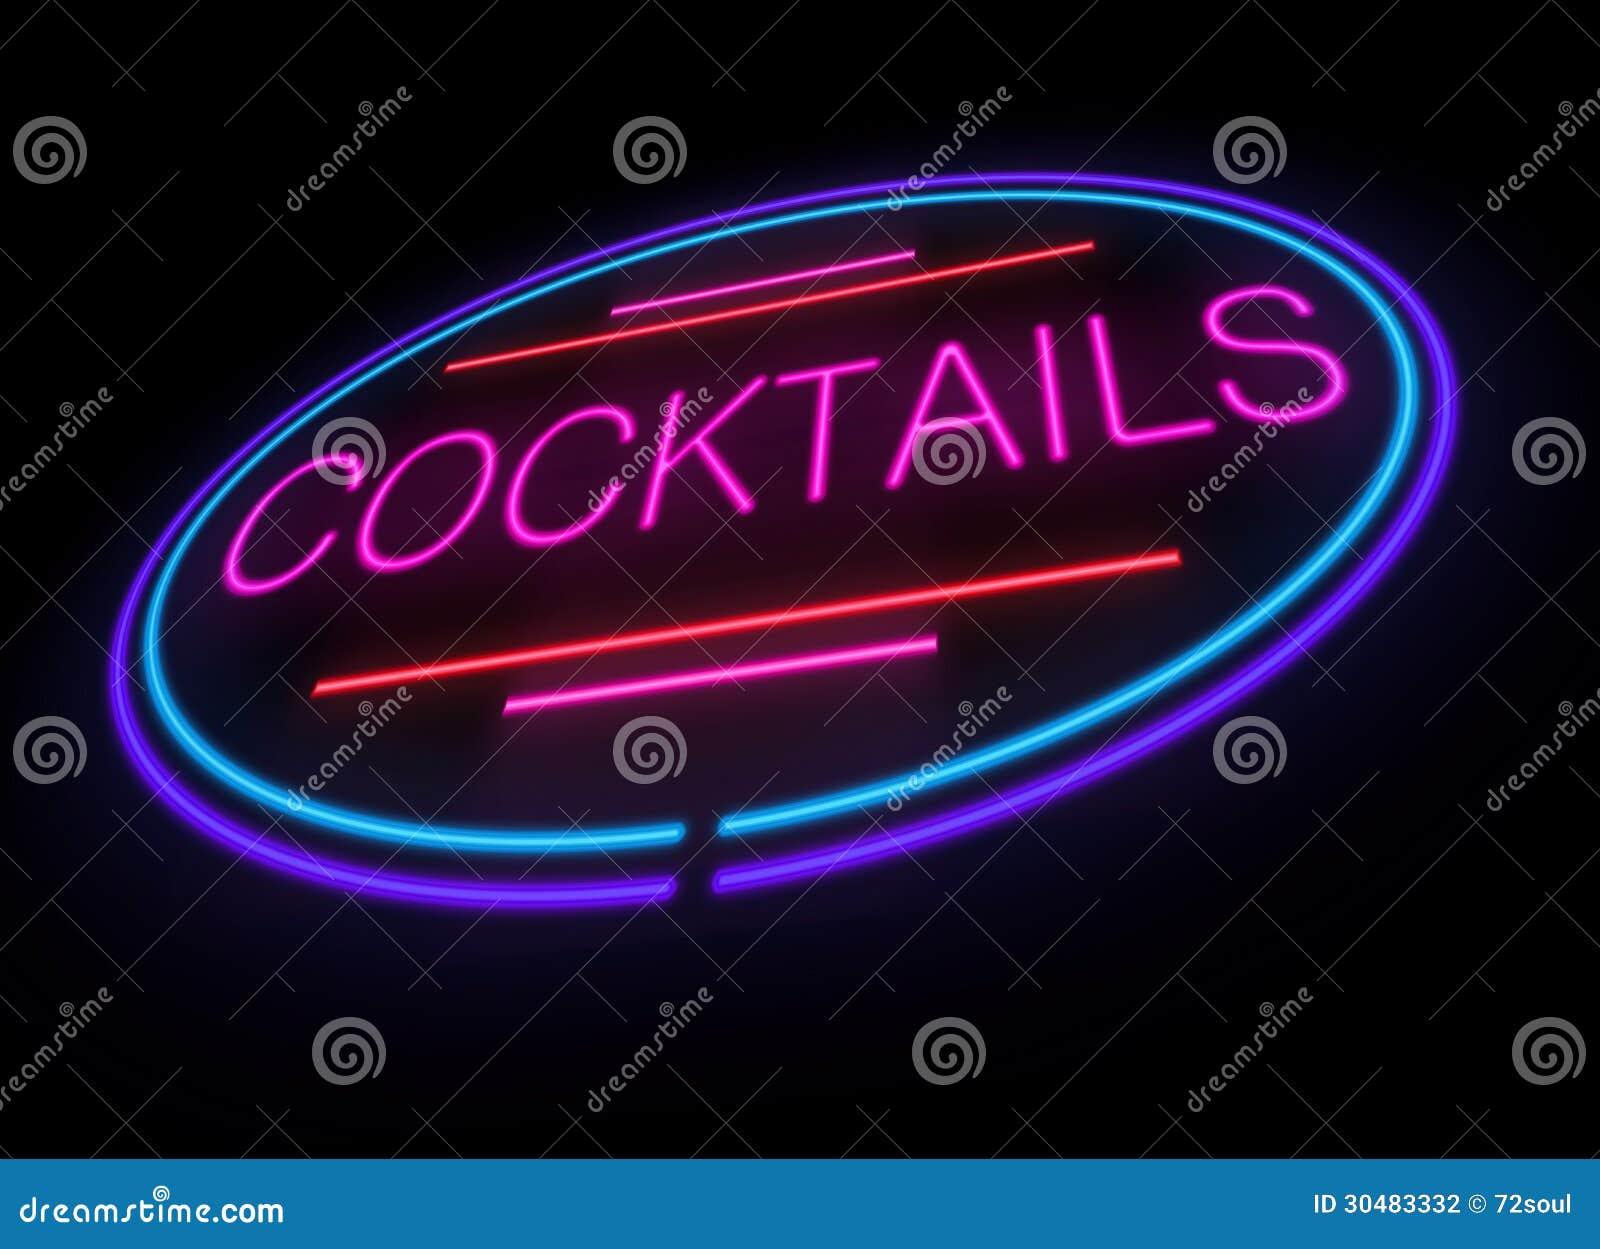 Neon cocktails sign. stock illustration. Illustration of